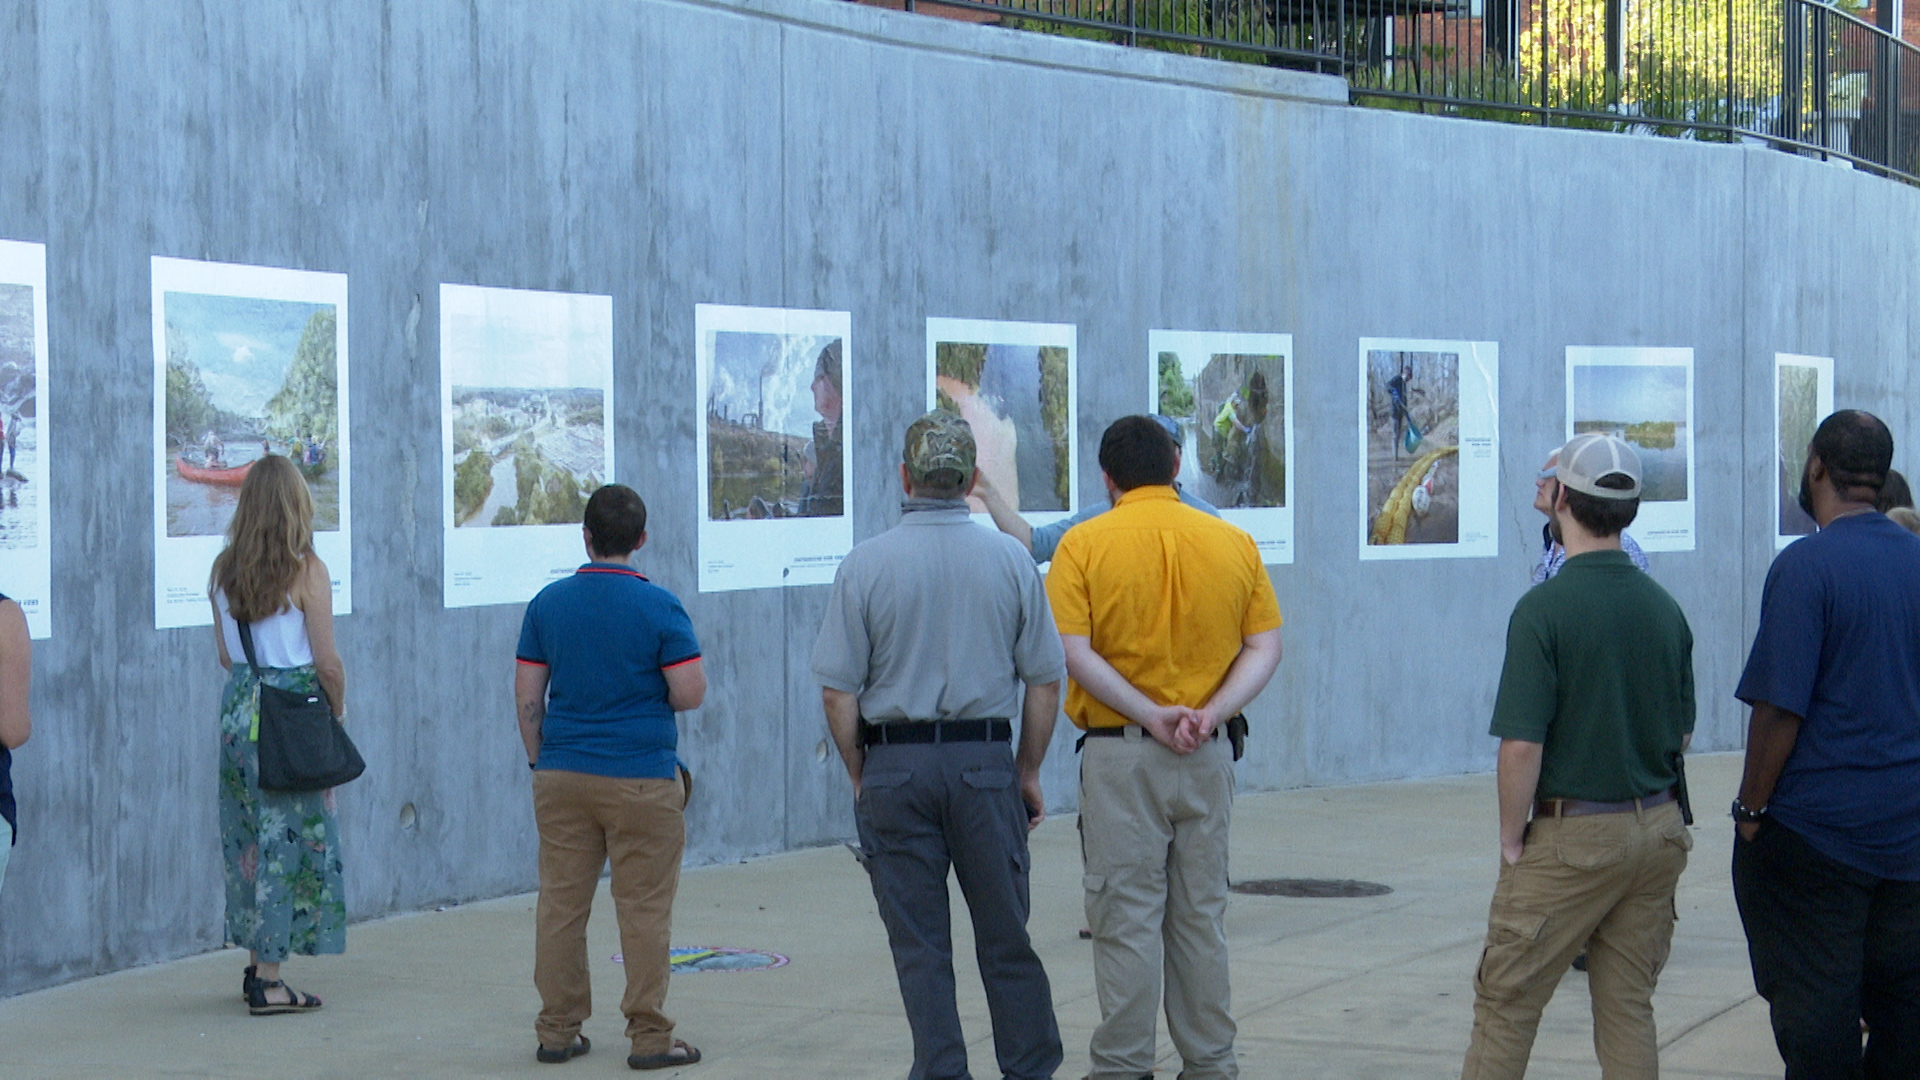 RiverViews outdoor photo exhibit